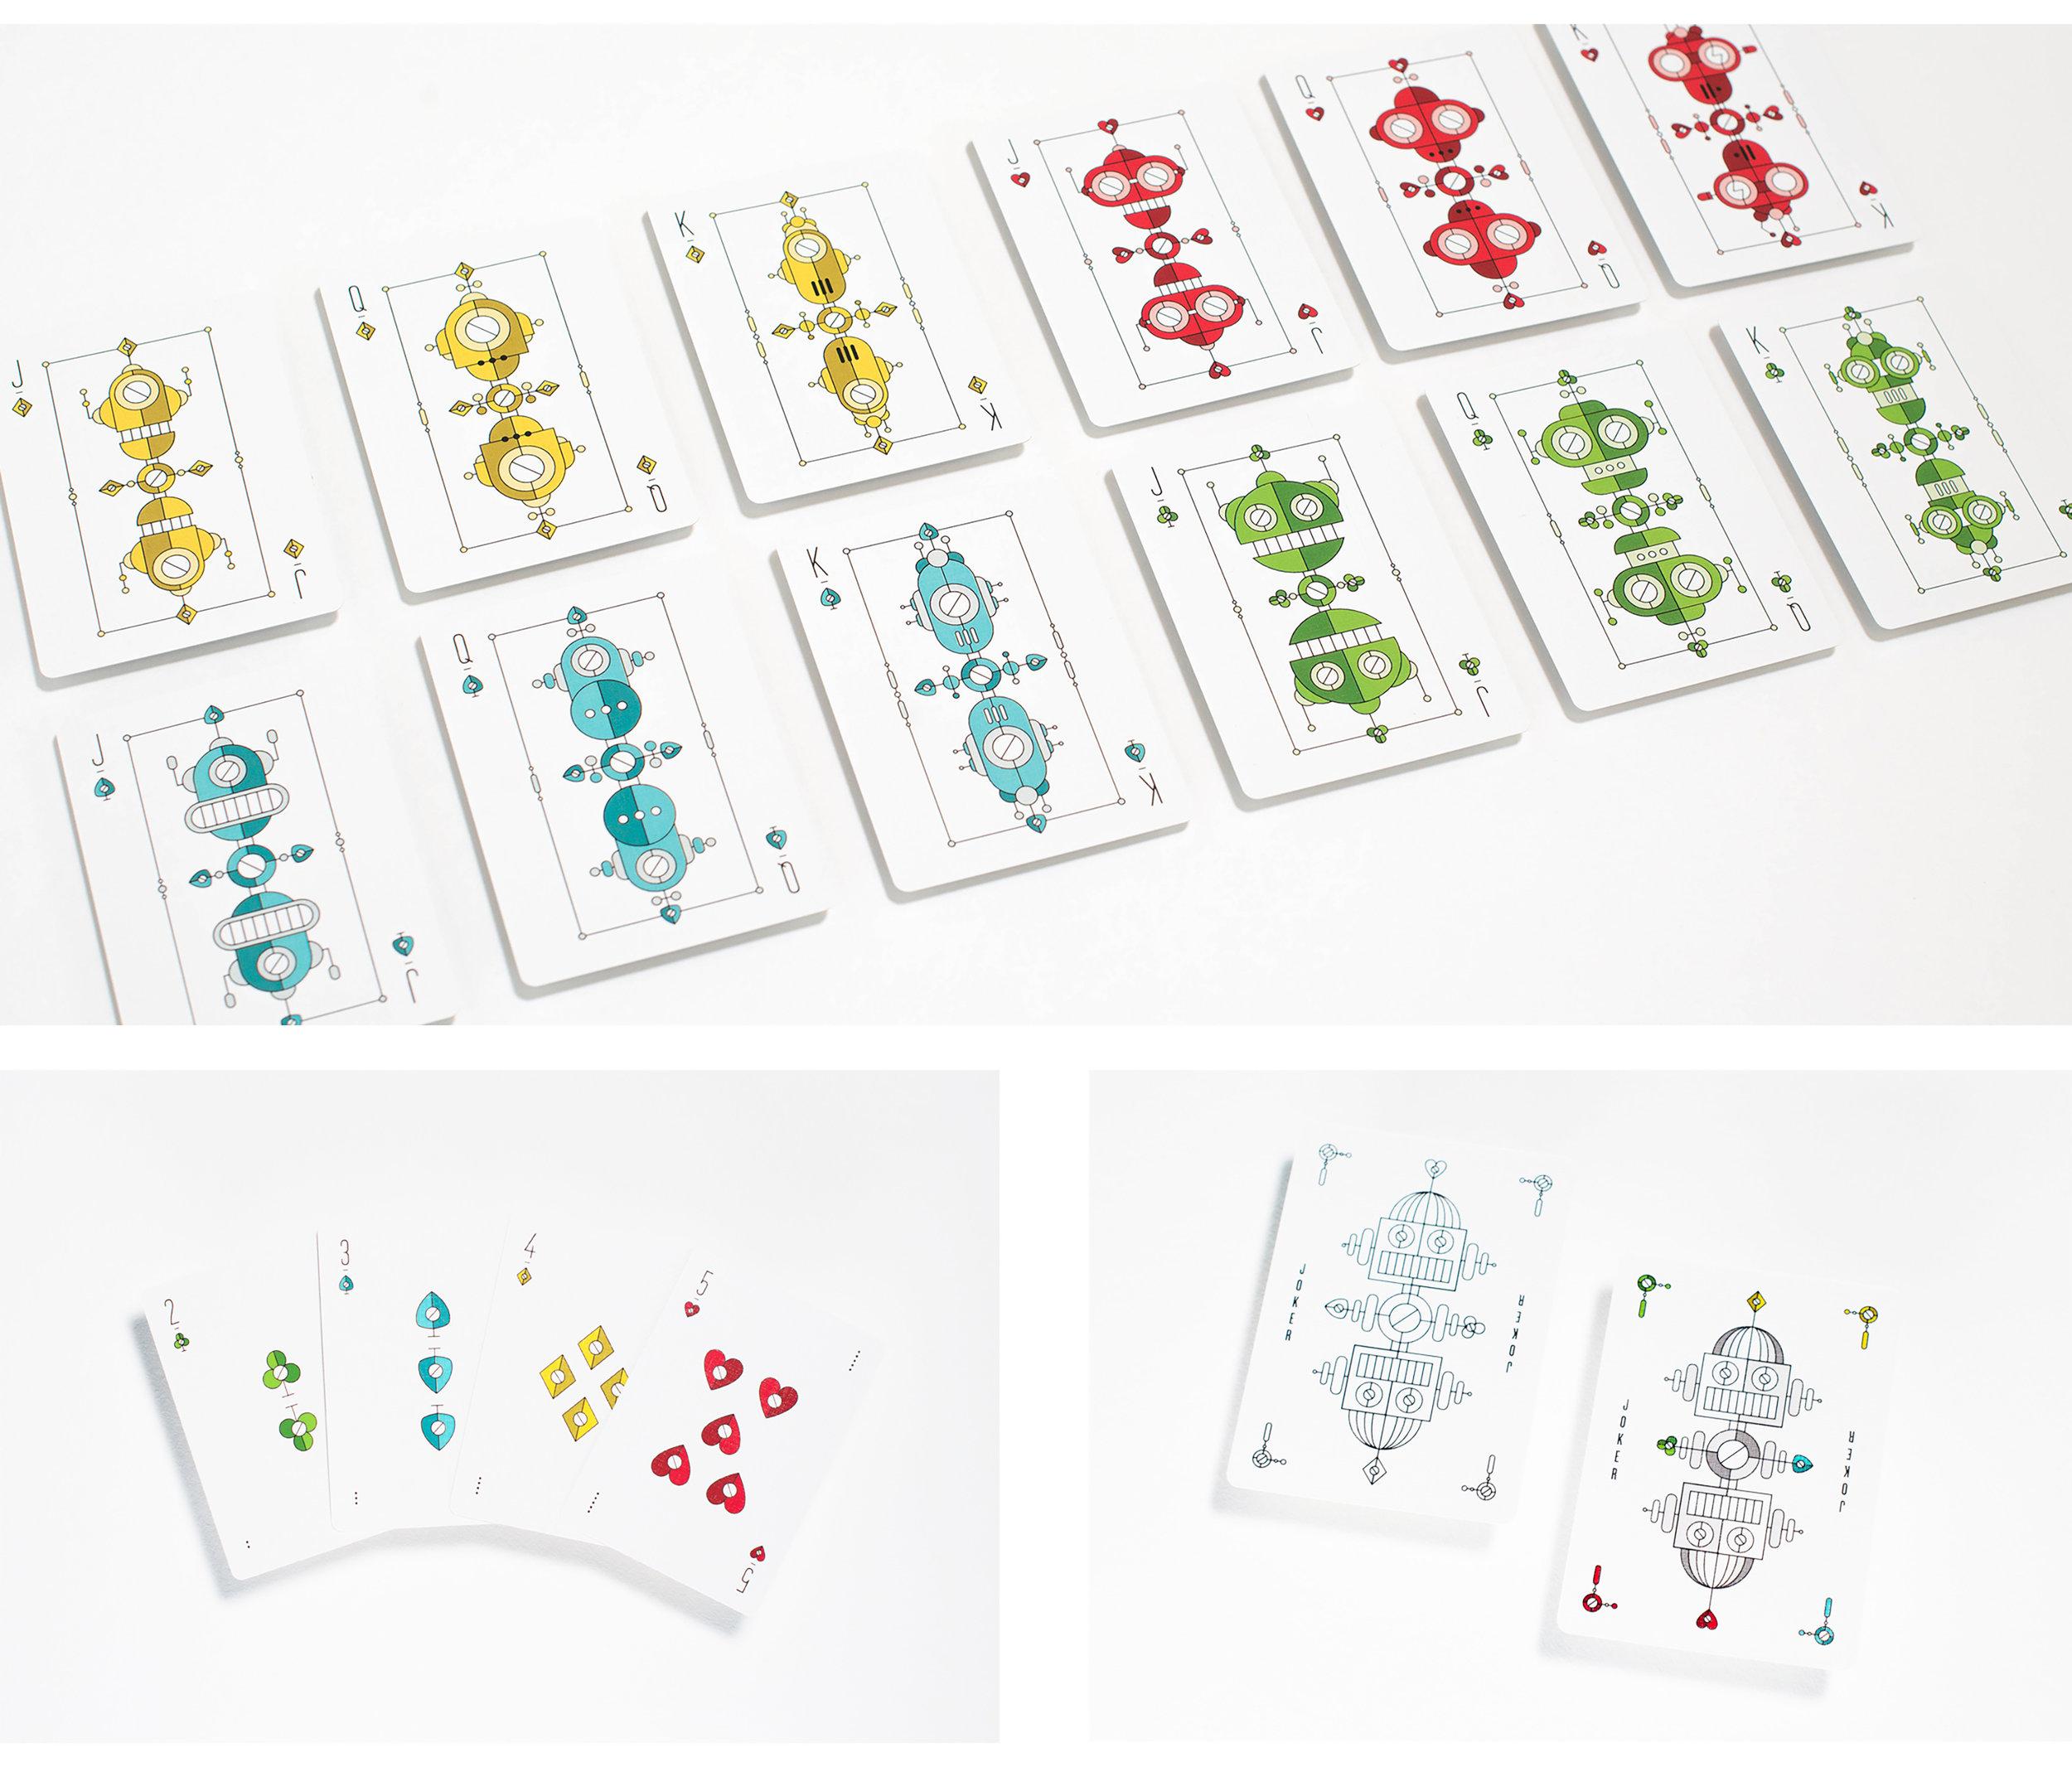 Robot-Playing-Cards_03.jpg